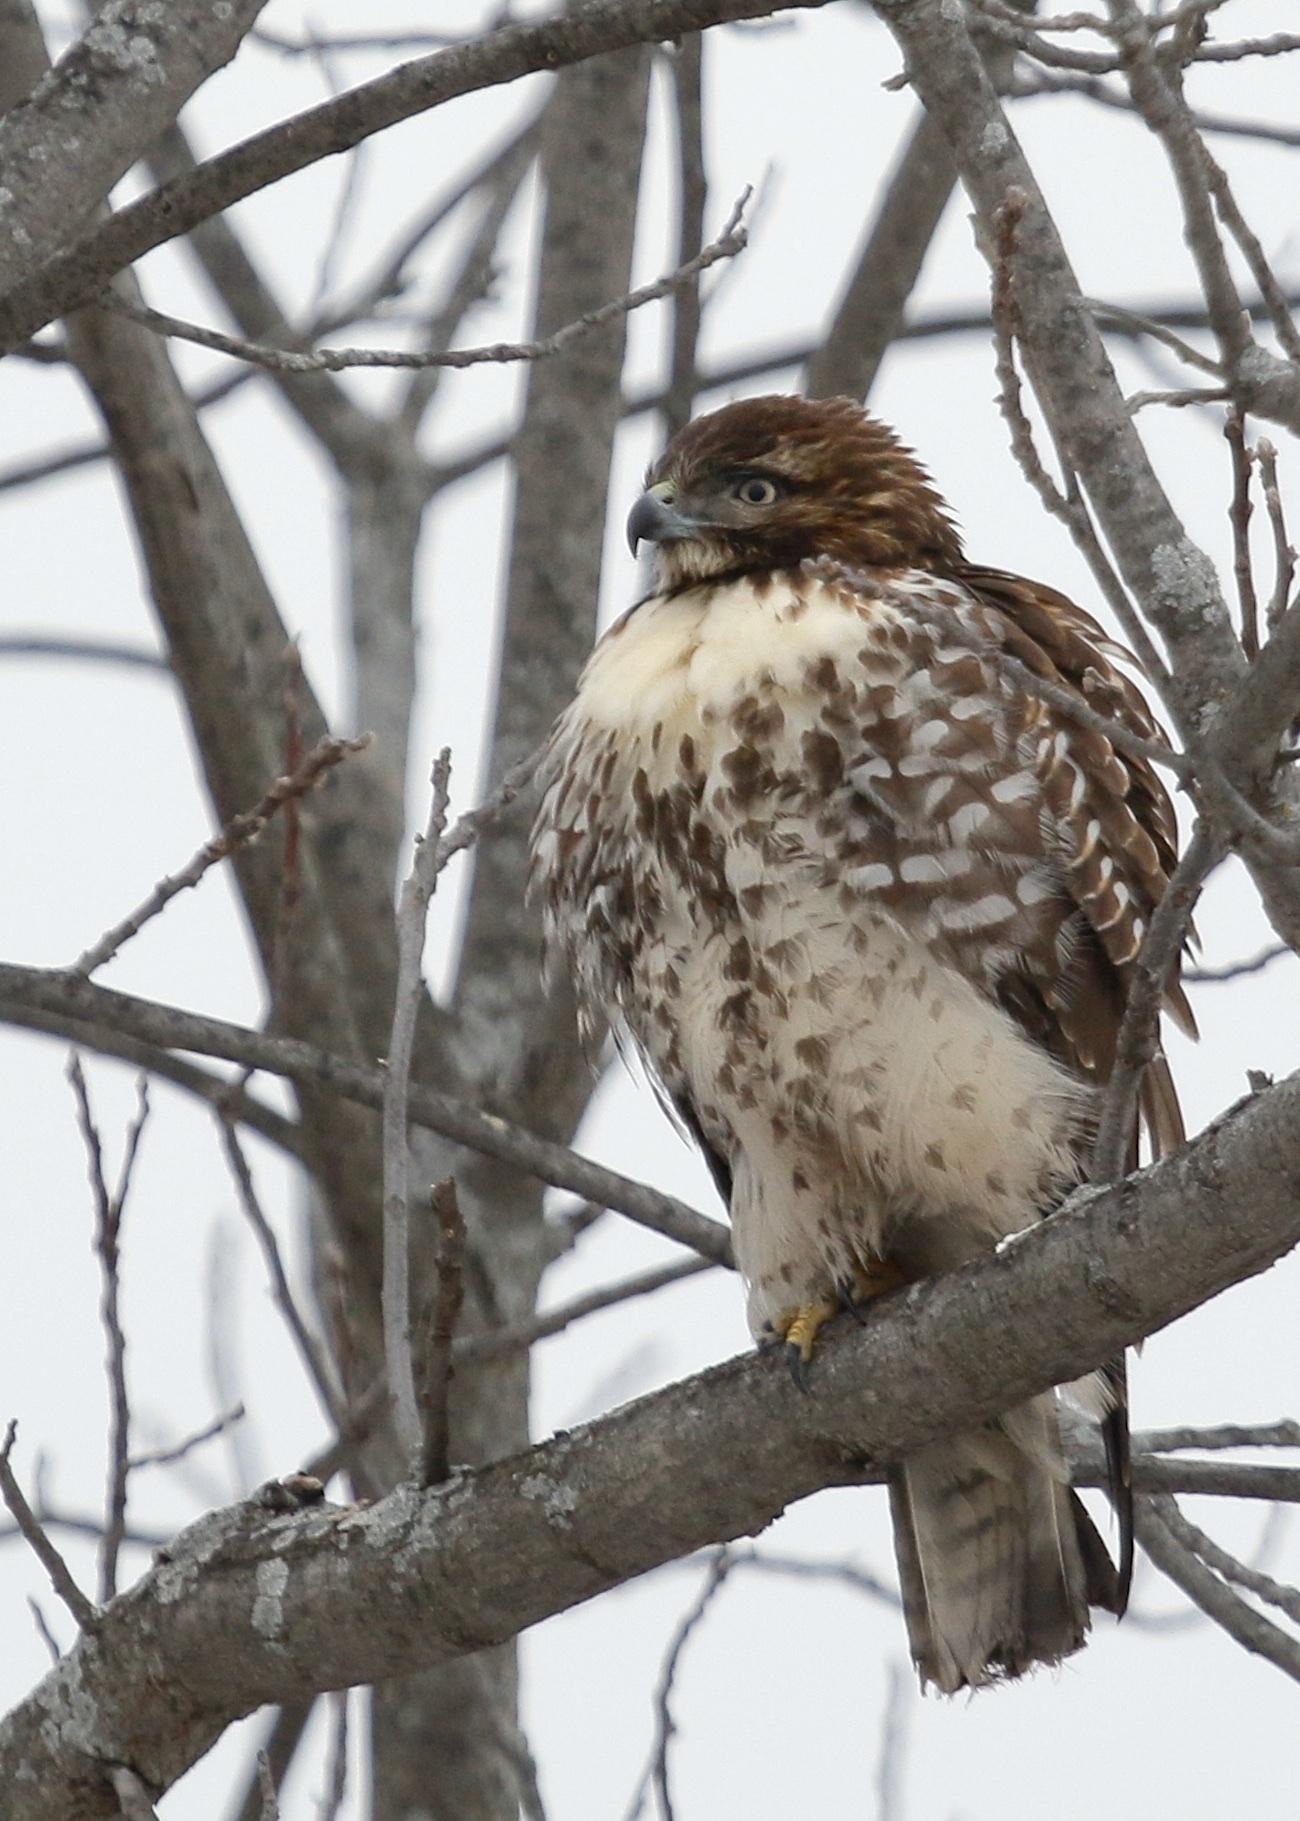 Red-tailed Hawk in New Hampton, NY 1/11/15.